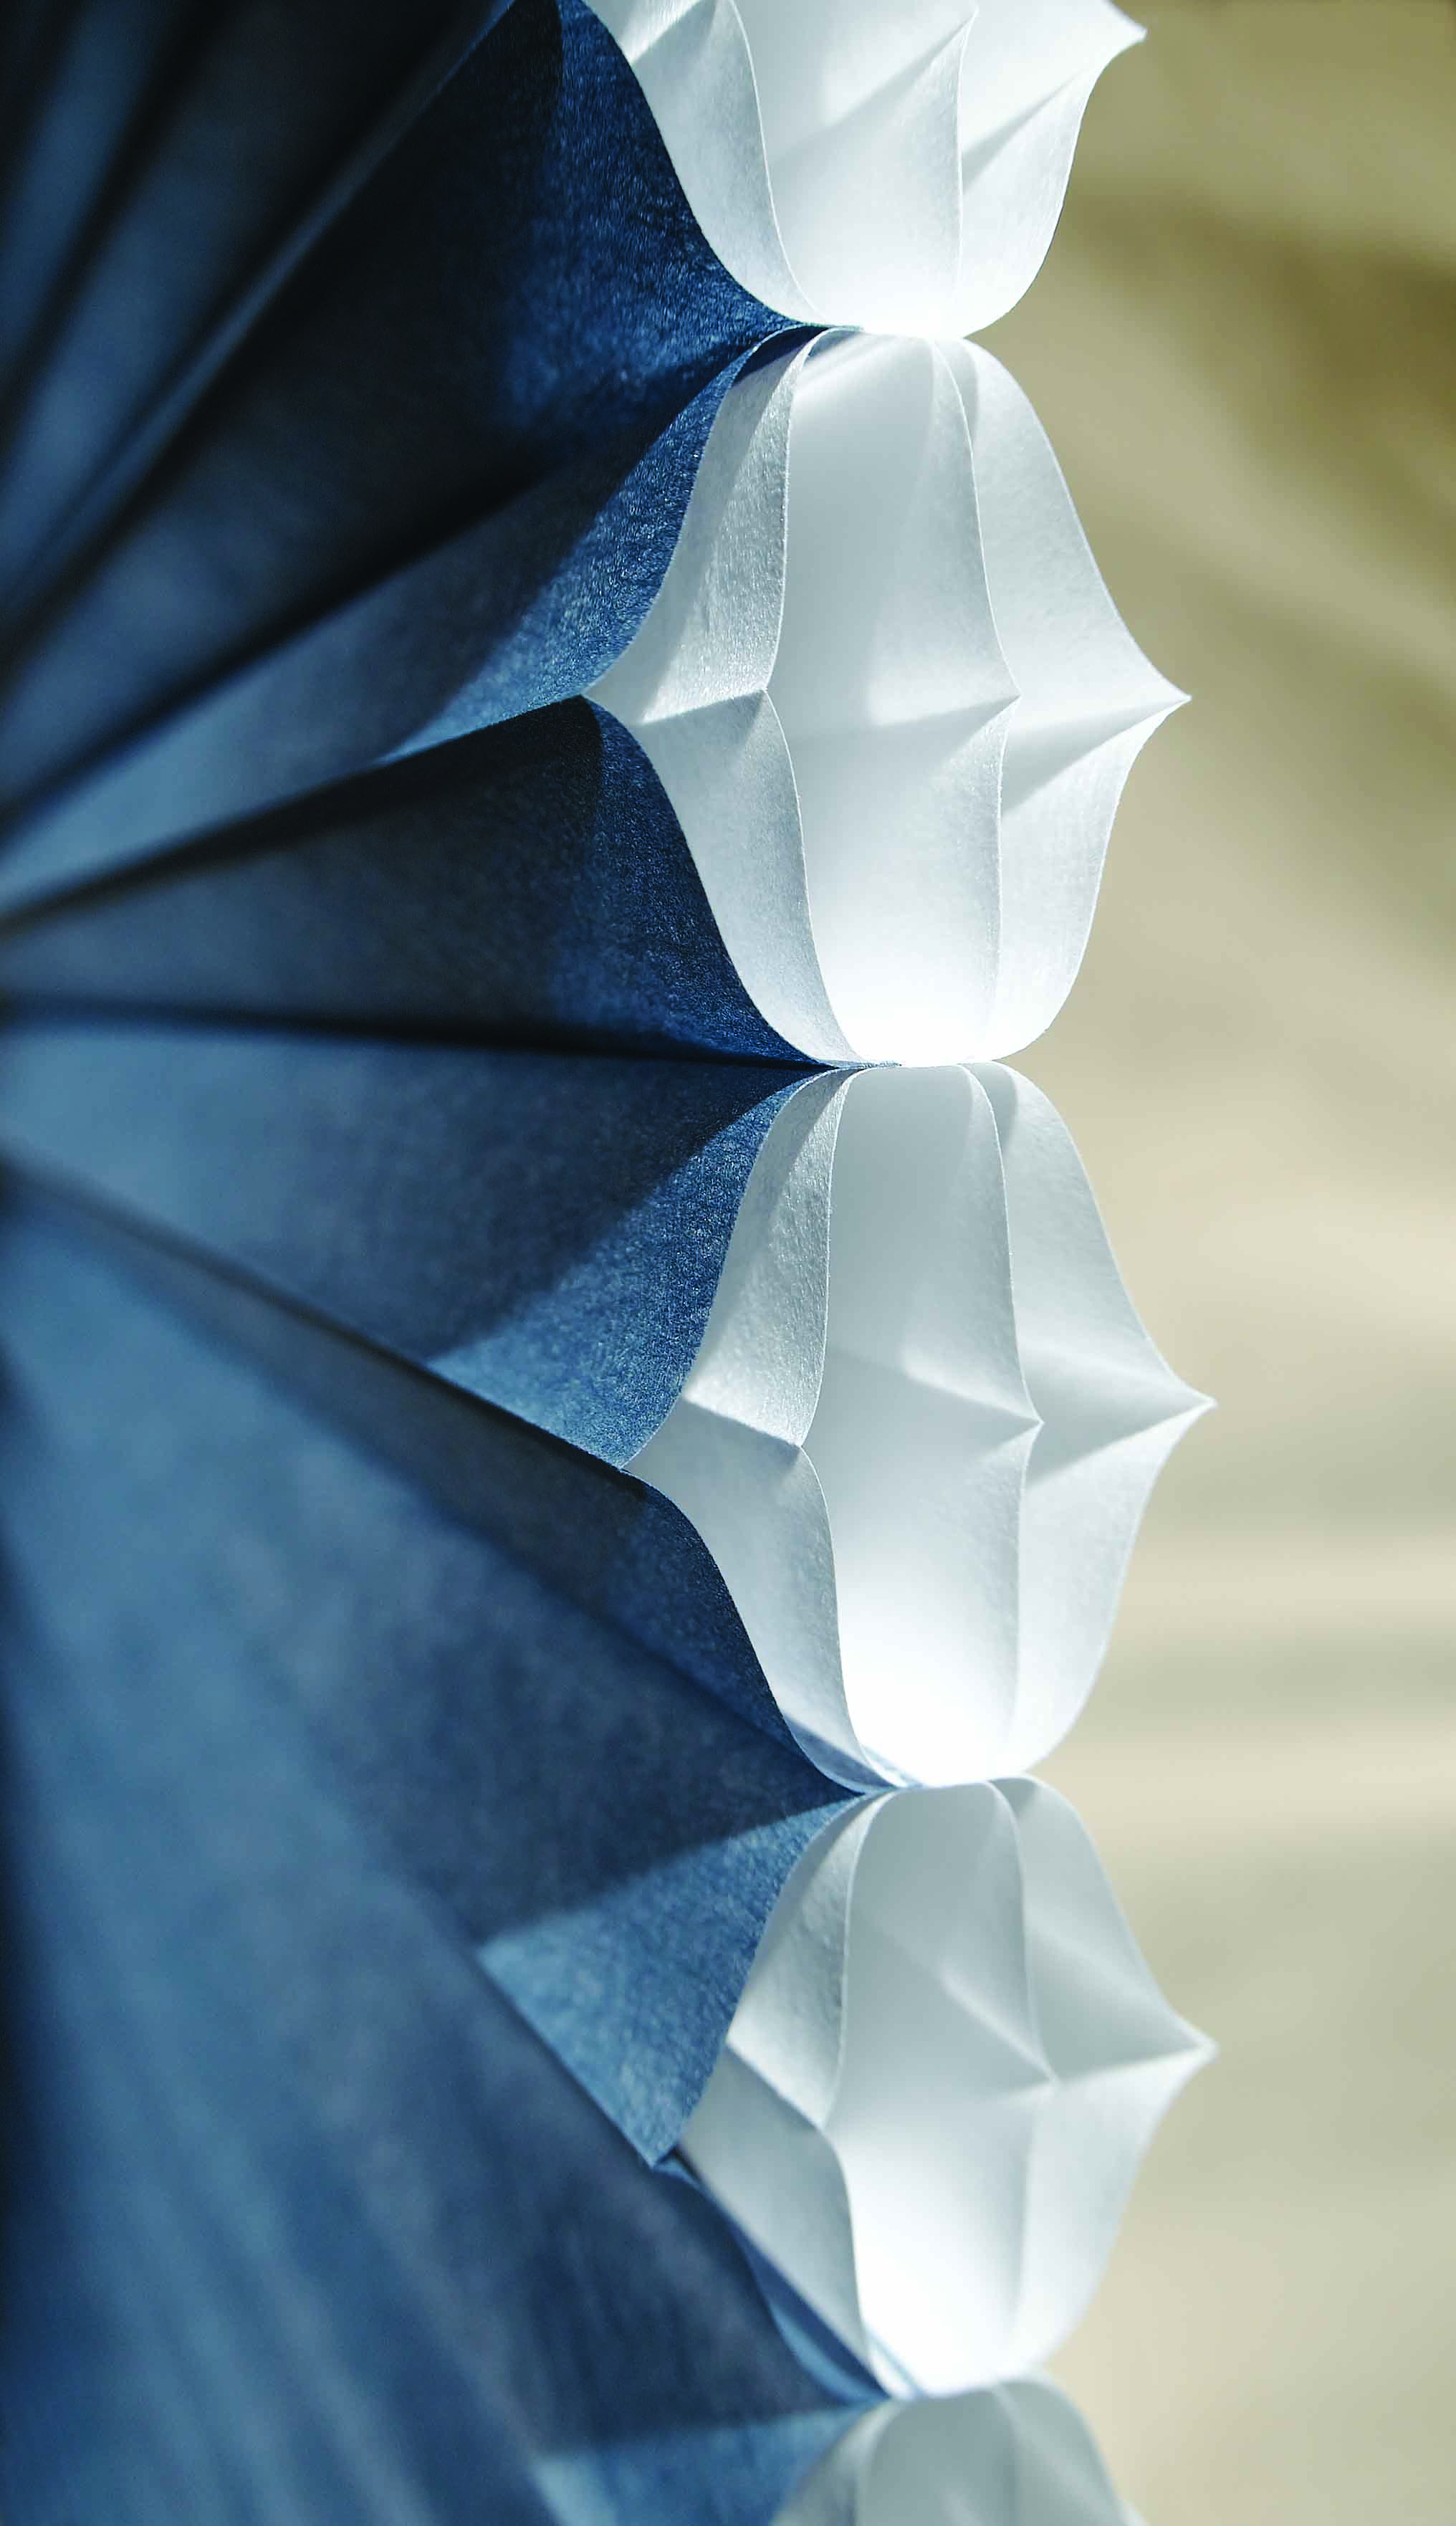 Panache Fabric Detail Blue